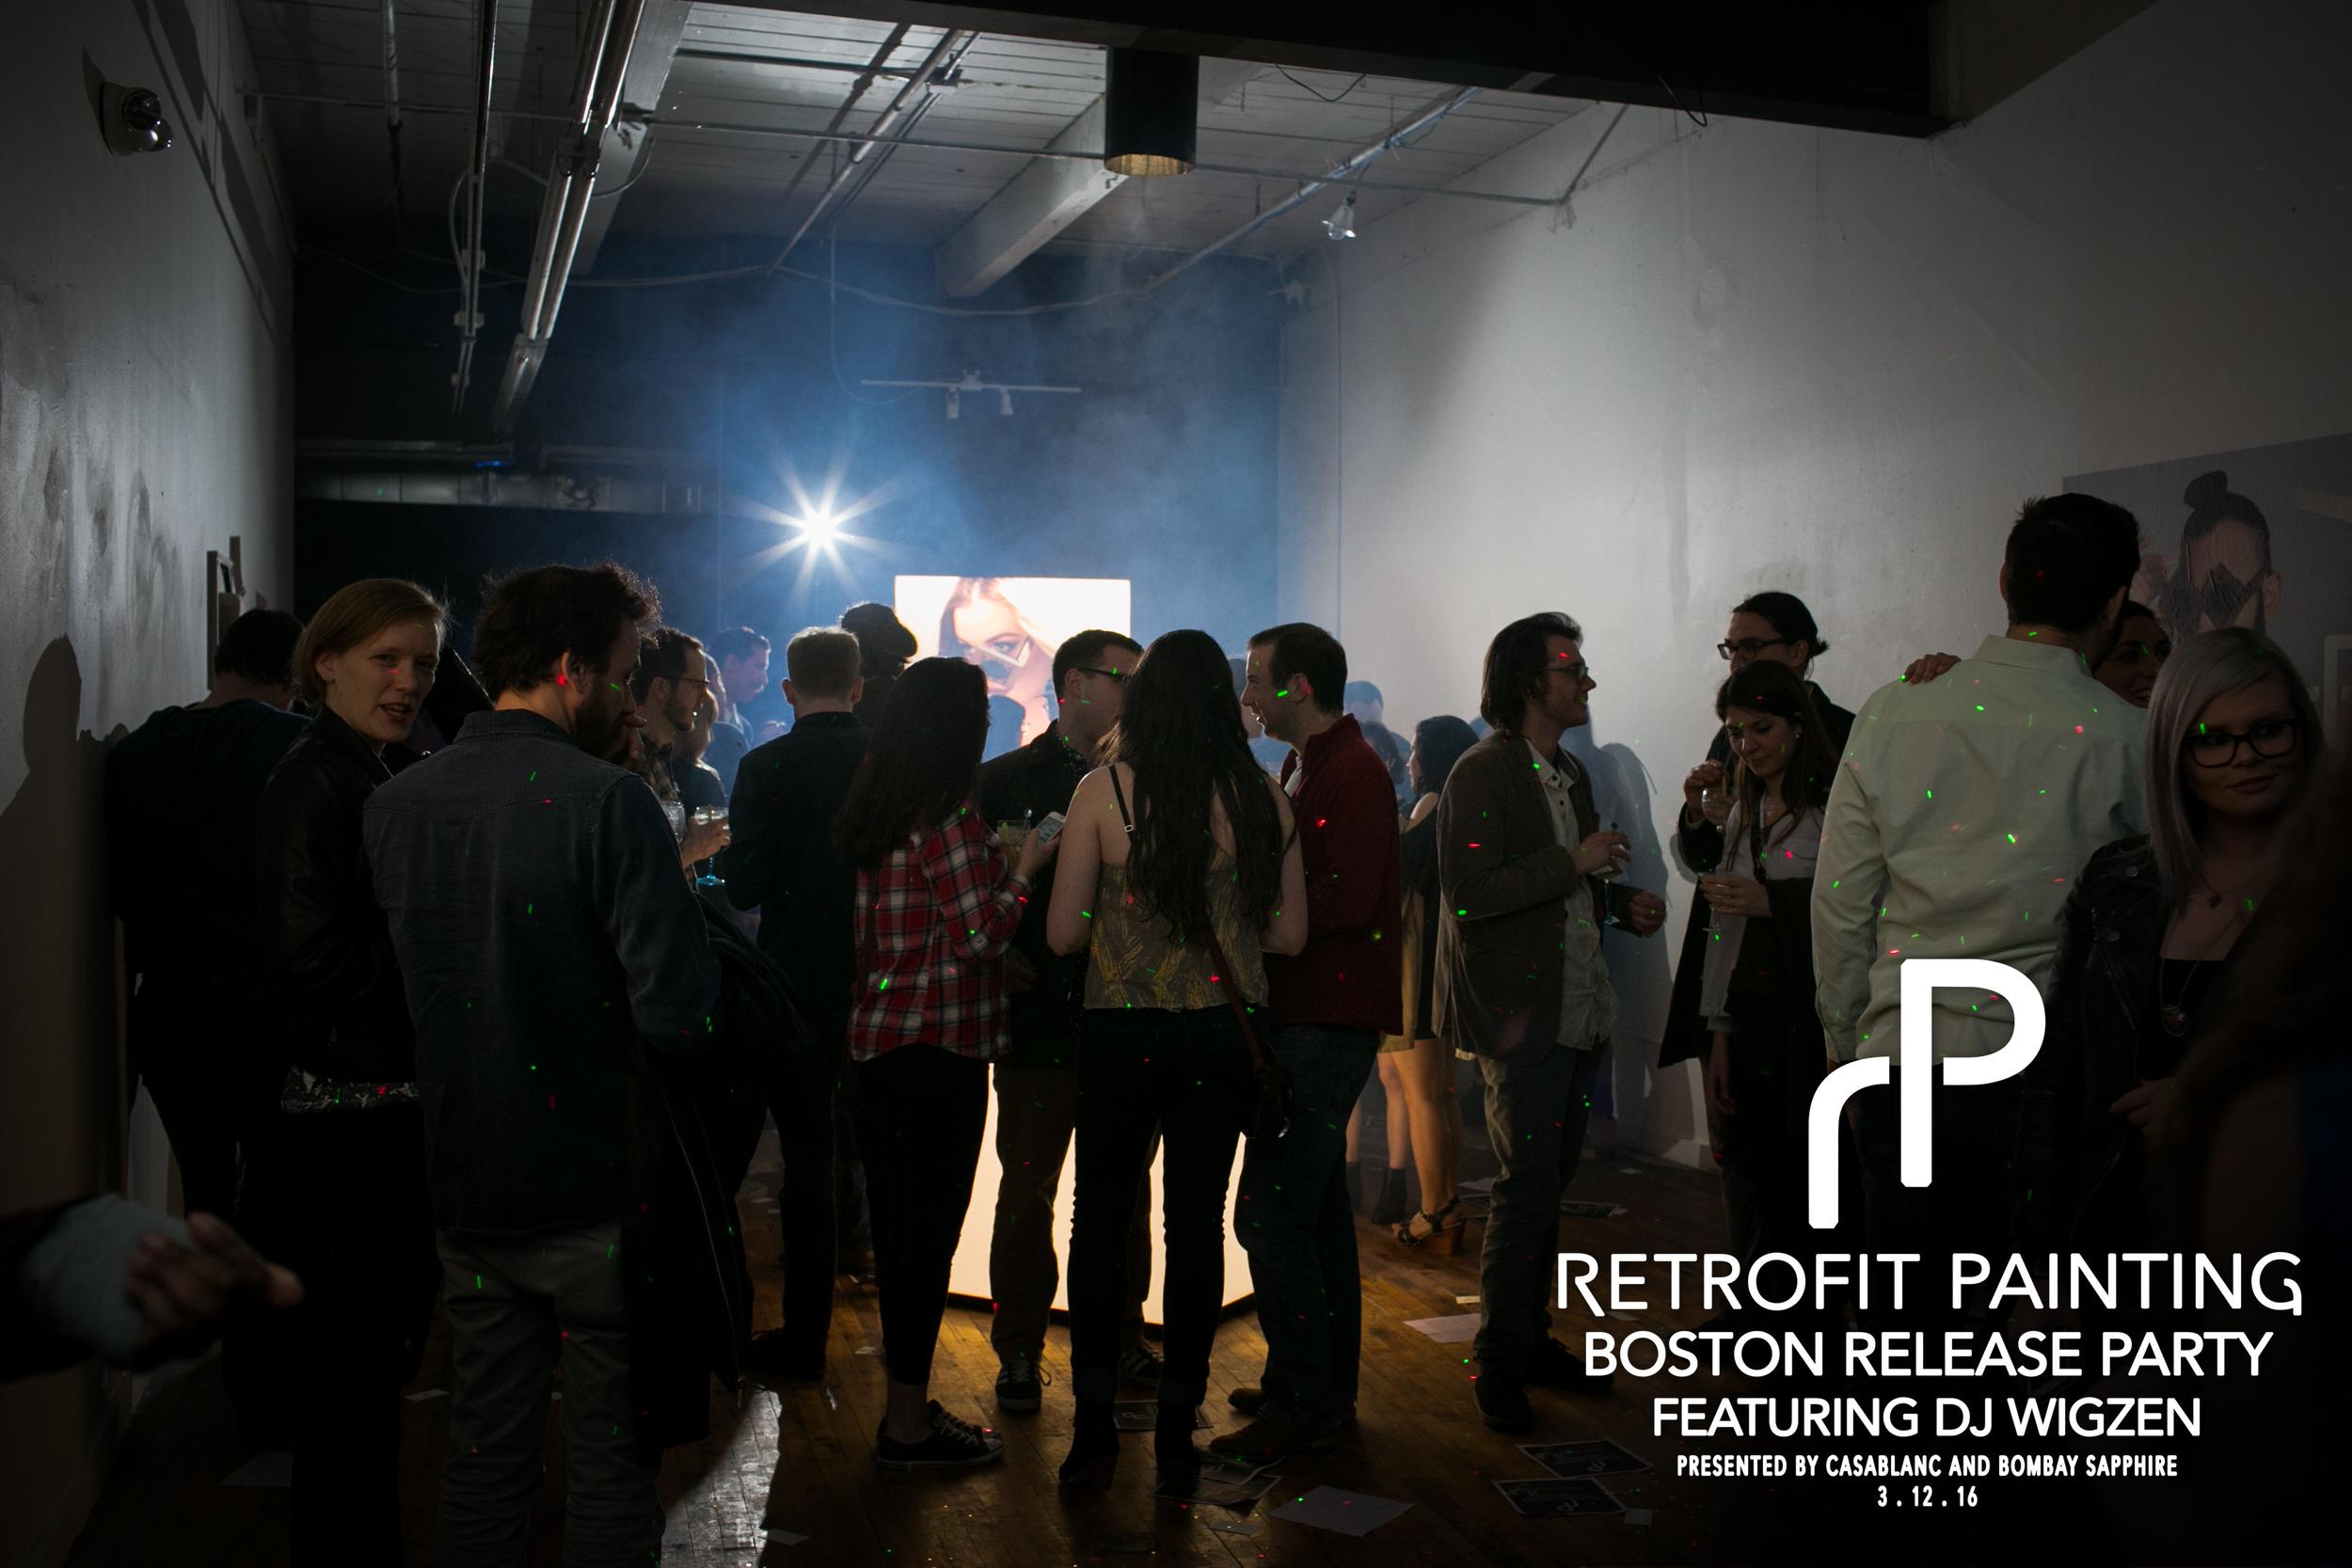 Retrofit Painting Boston Release Party 0190.jpg